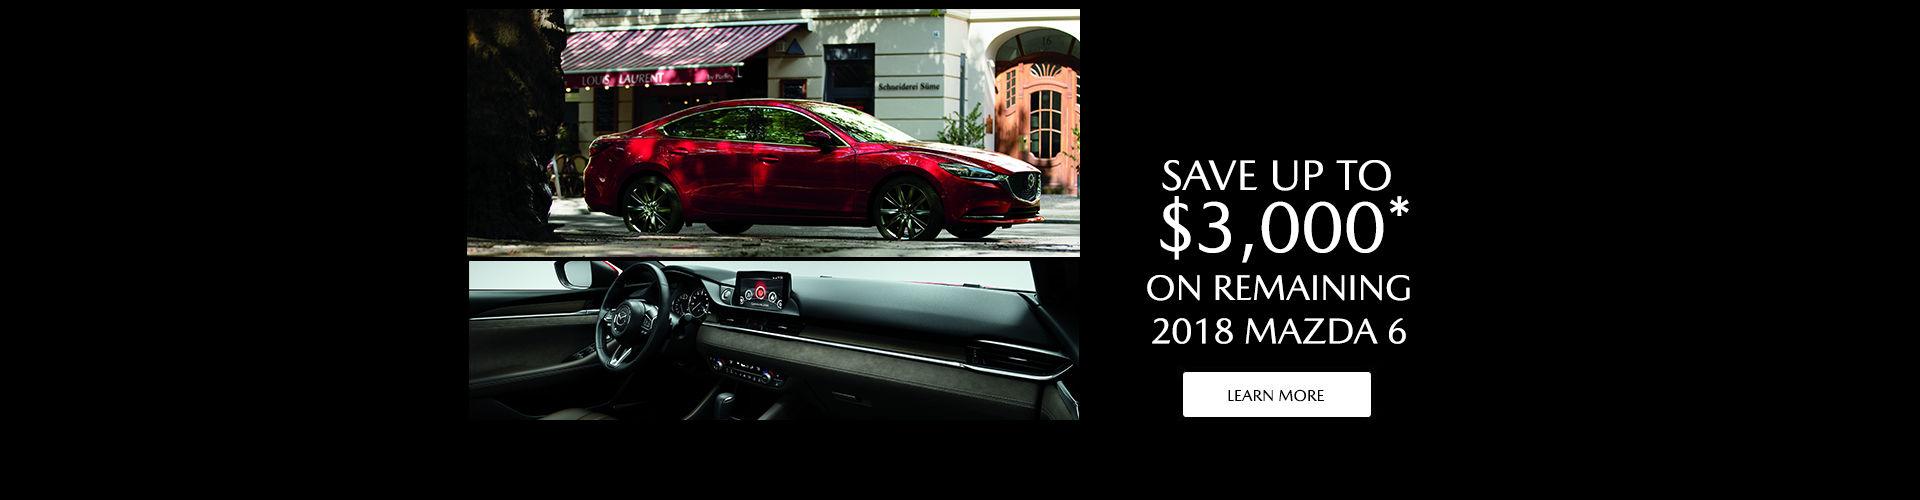 2018 Mazda 6 Clearance